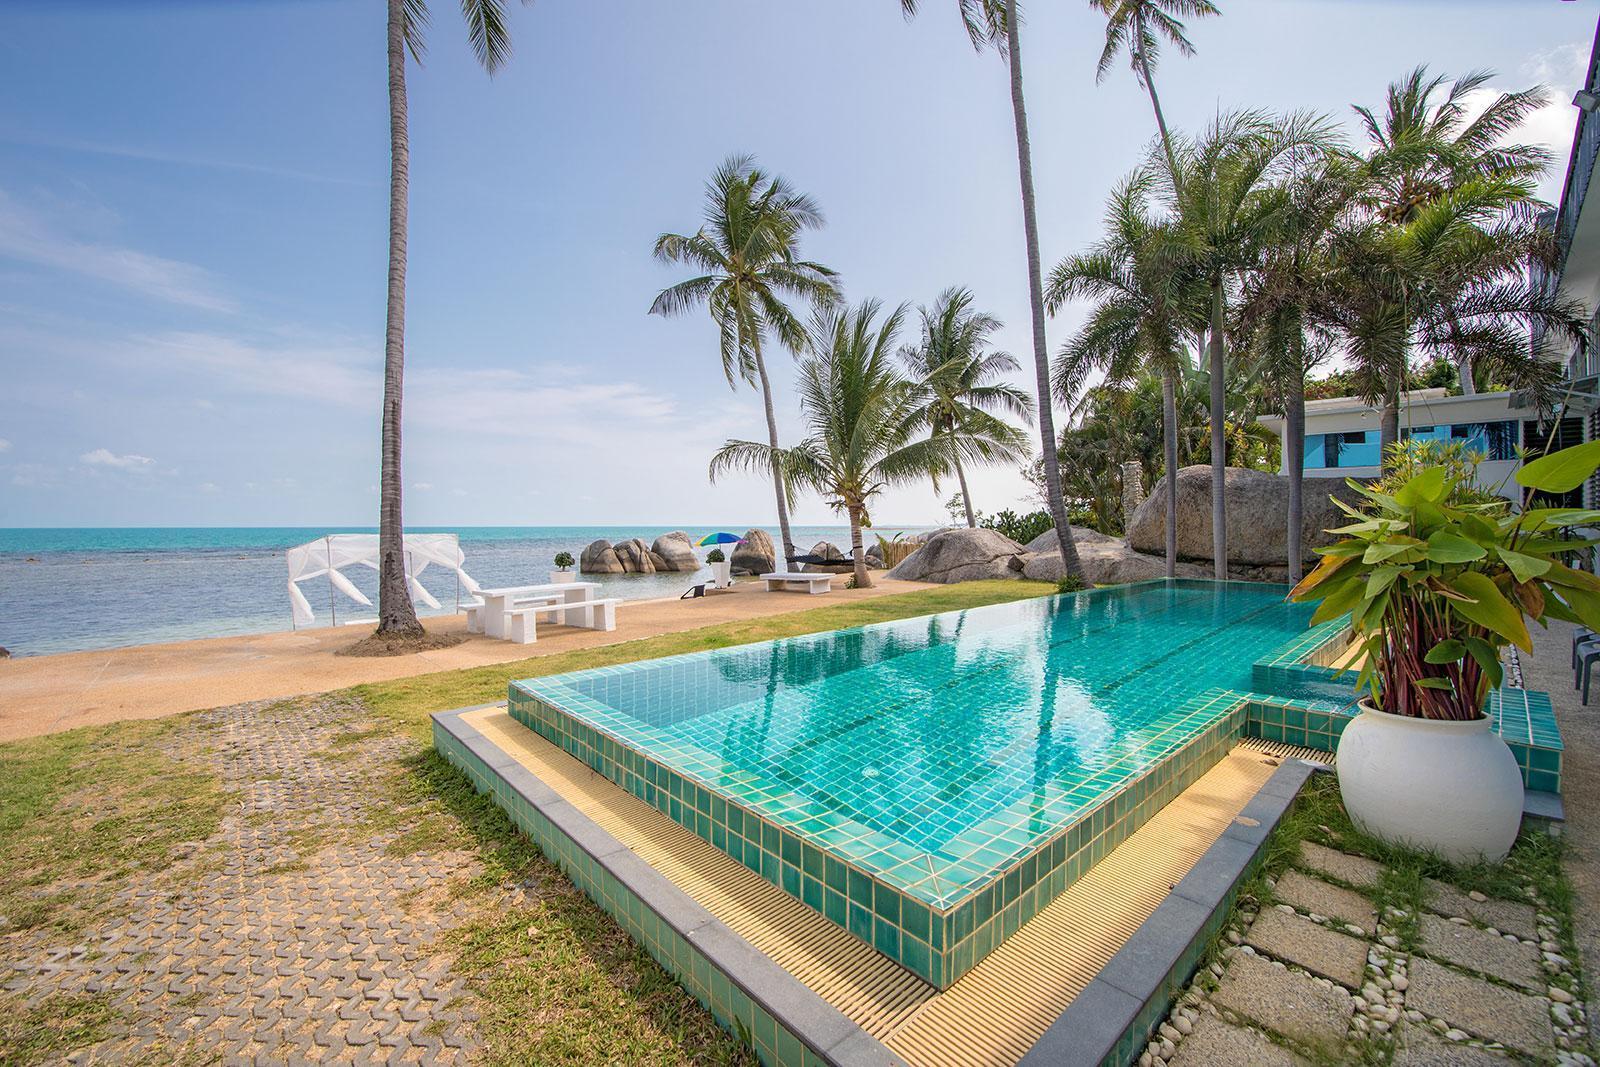 Beachfront loft style villa with private pool Beachfront loft style villa with private pool